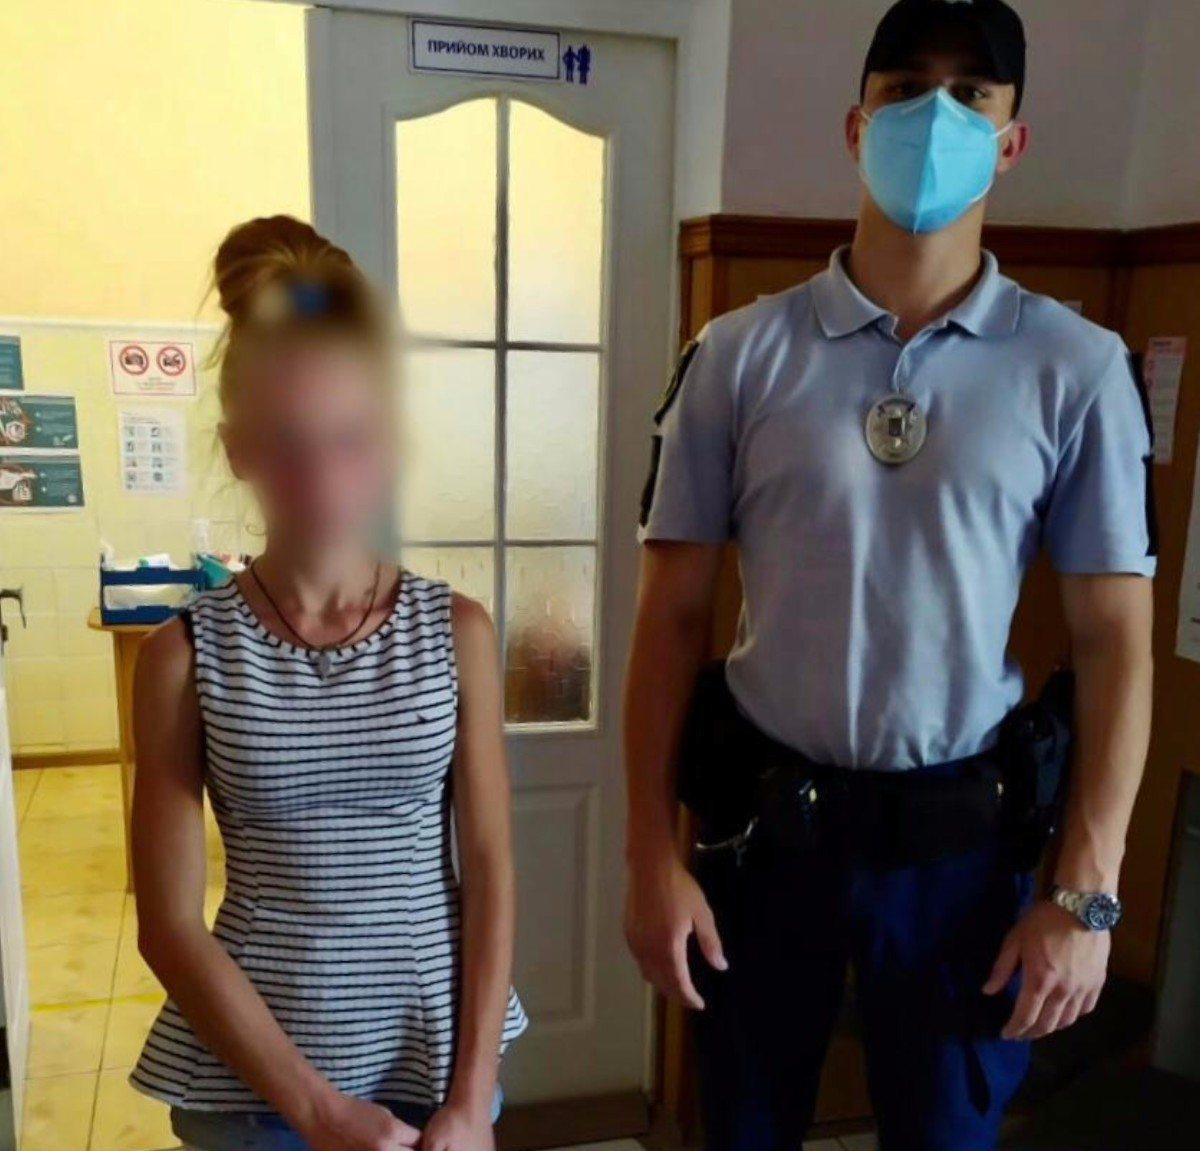 Херсонские полицейские защитили 15-летнюю девочку от отца и дяди